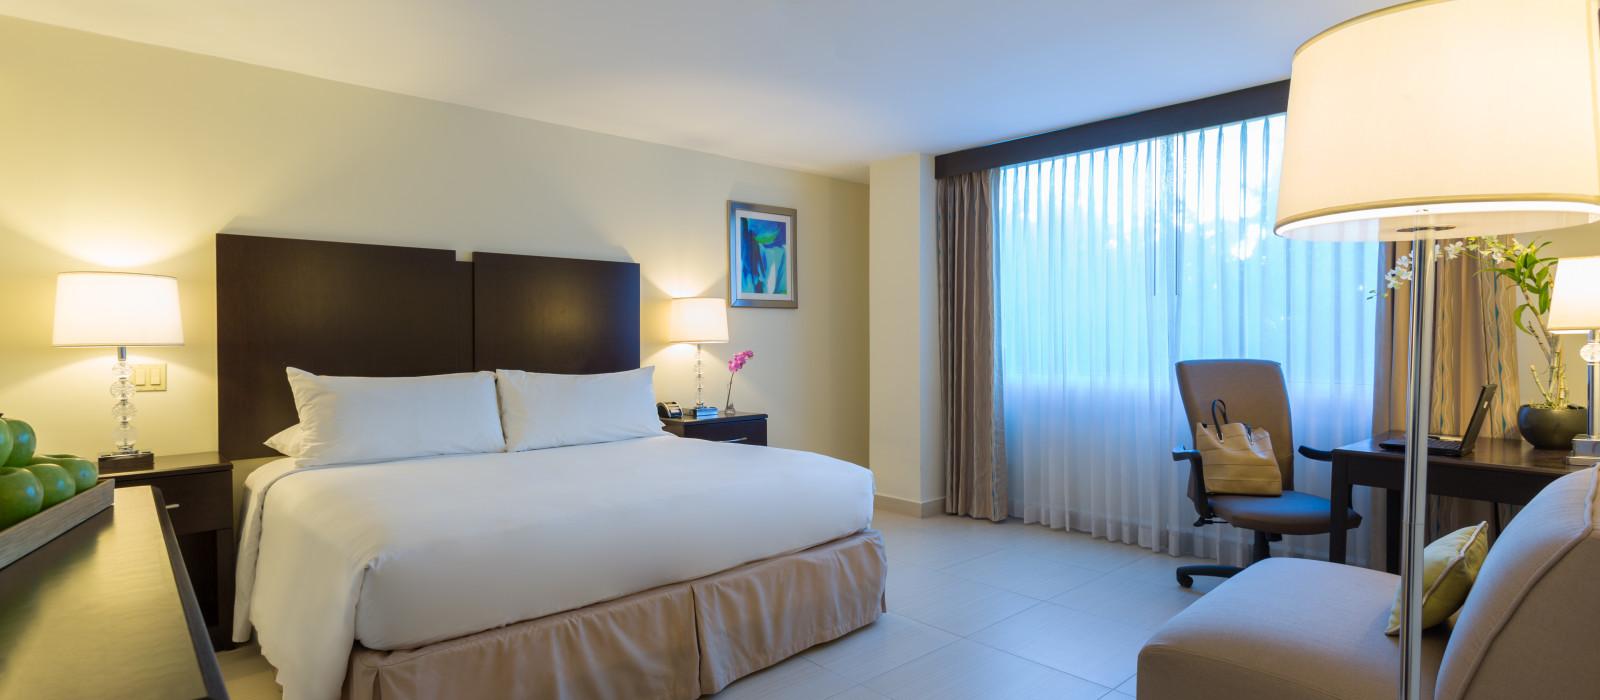 Hotel DoubleTree by Hilton Panama City Panama